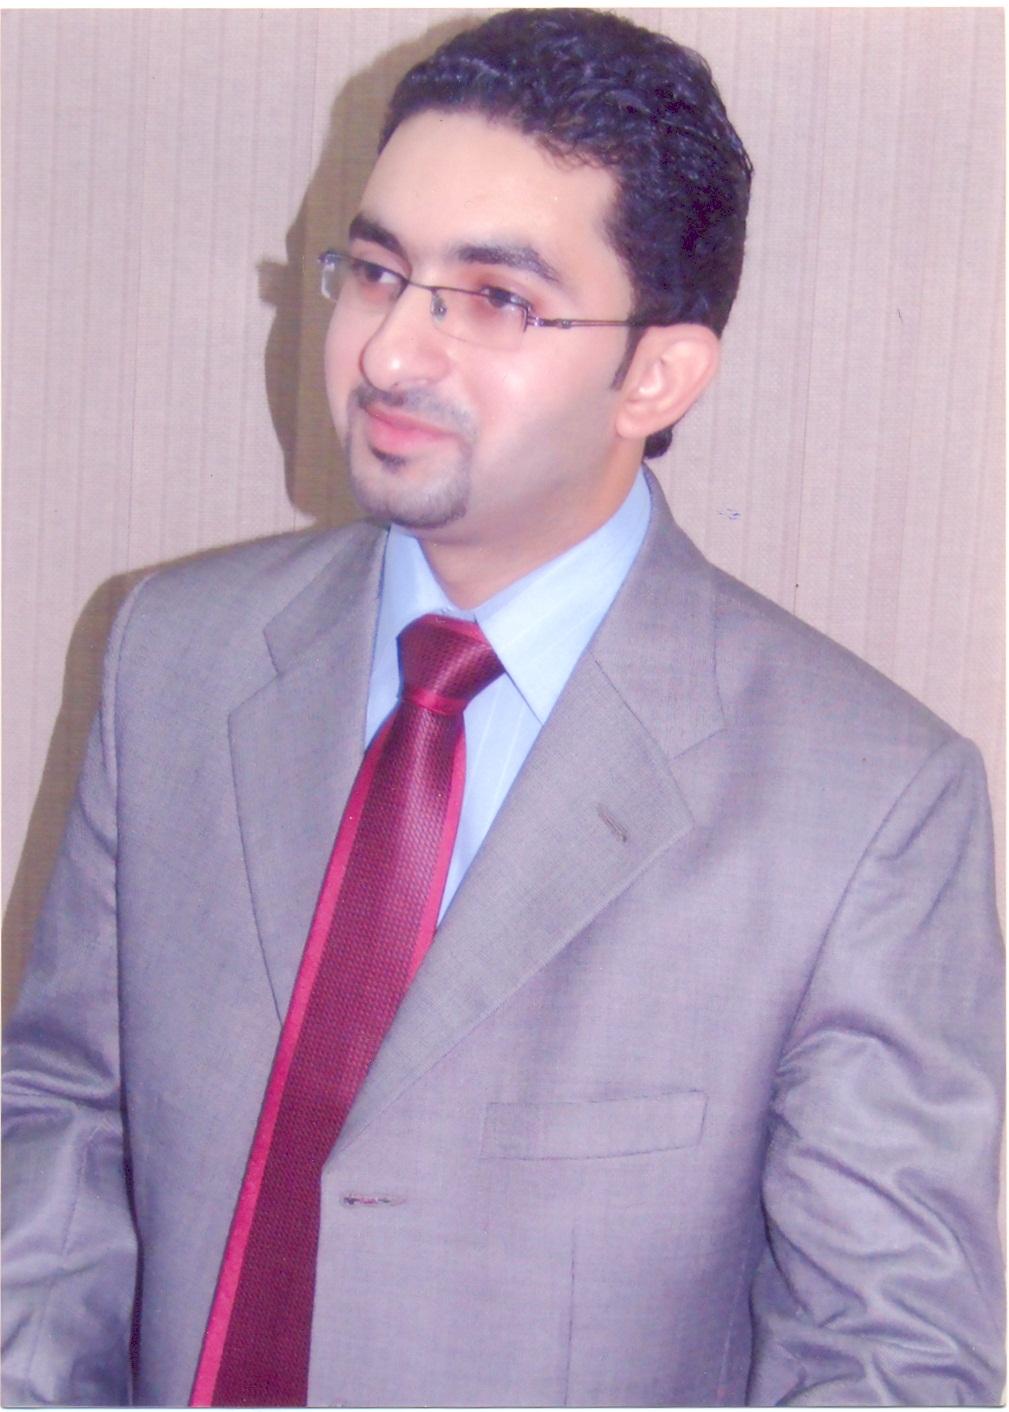 Alaa Salah Gouda Mohamed Salem